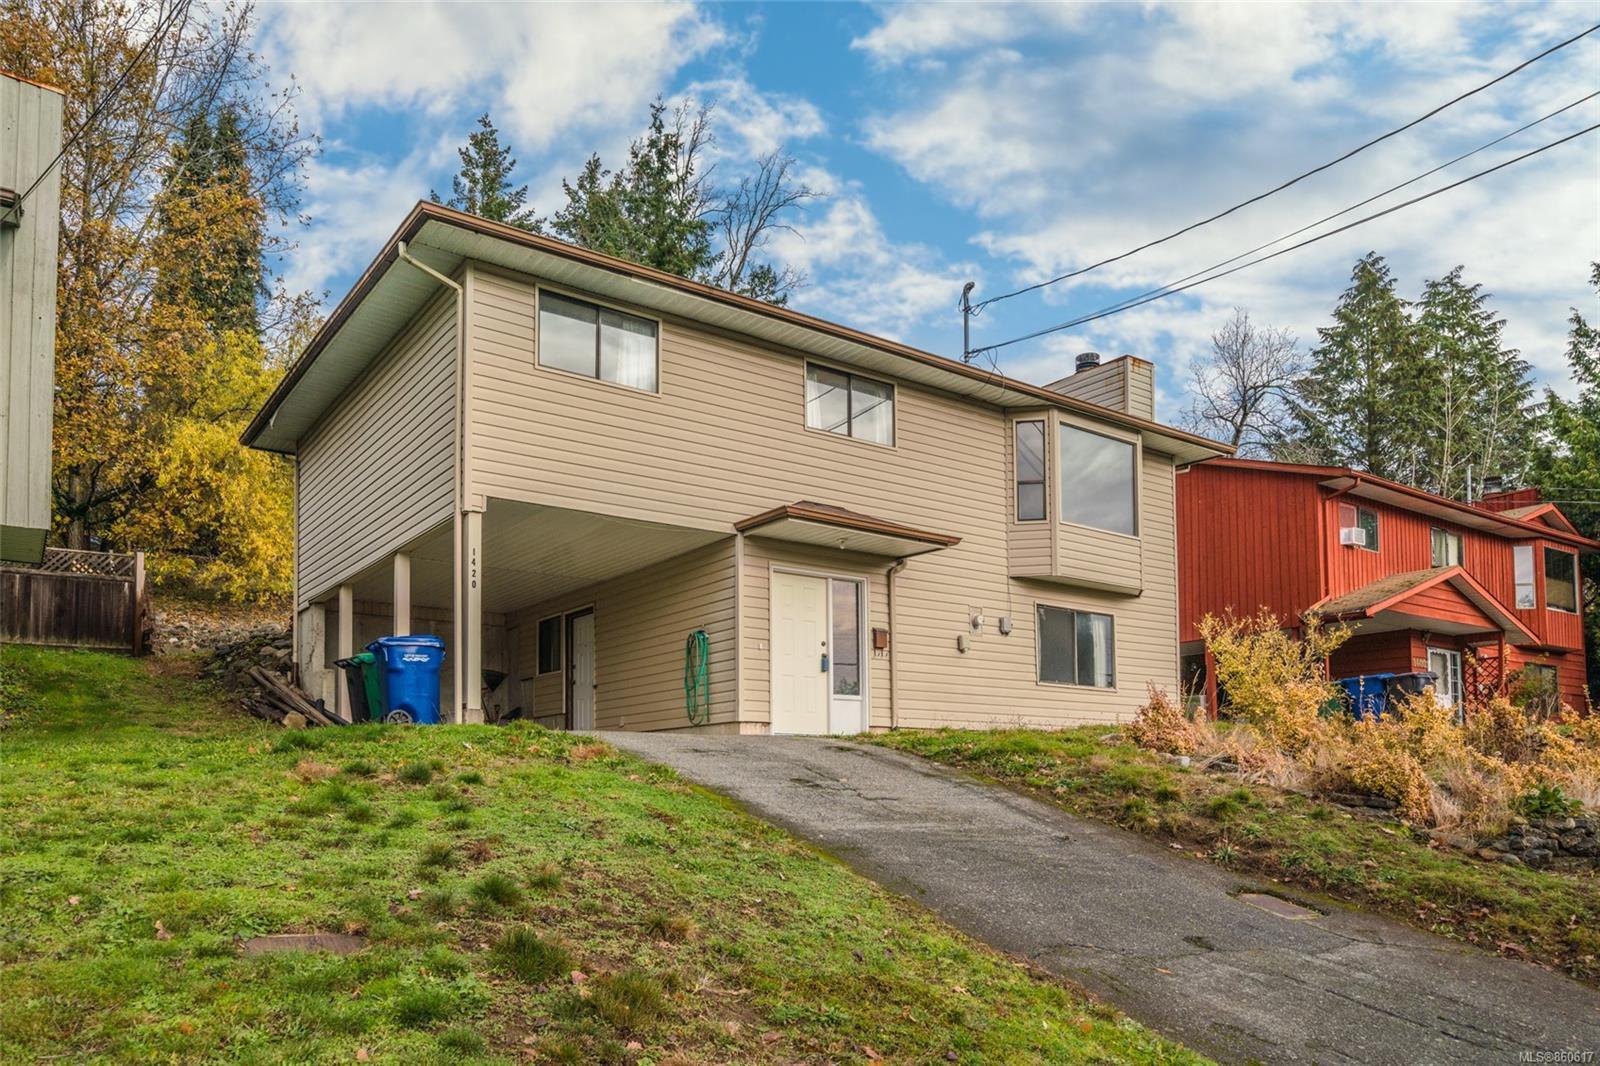 Main Photo: 1420 Bush St in : Na Central Nanaimo House for sale (Nanaimo)  : MLS®# 860617